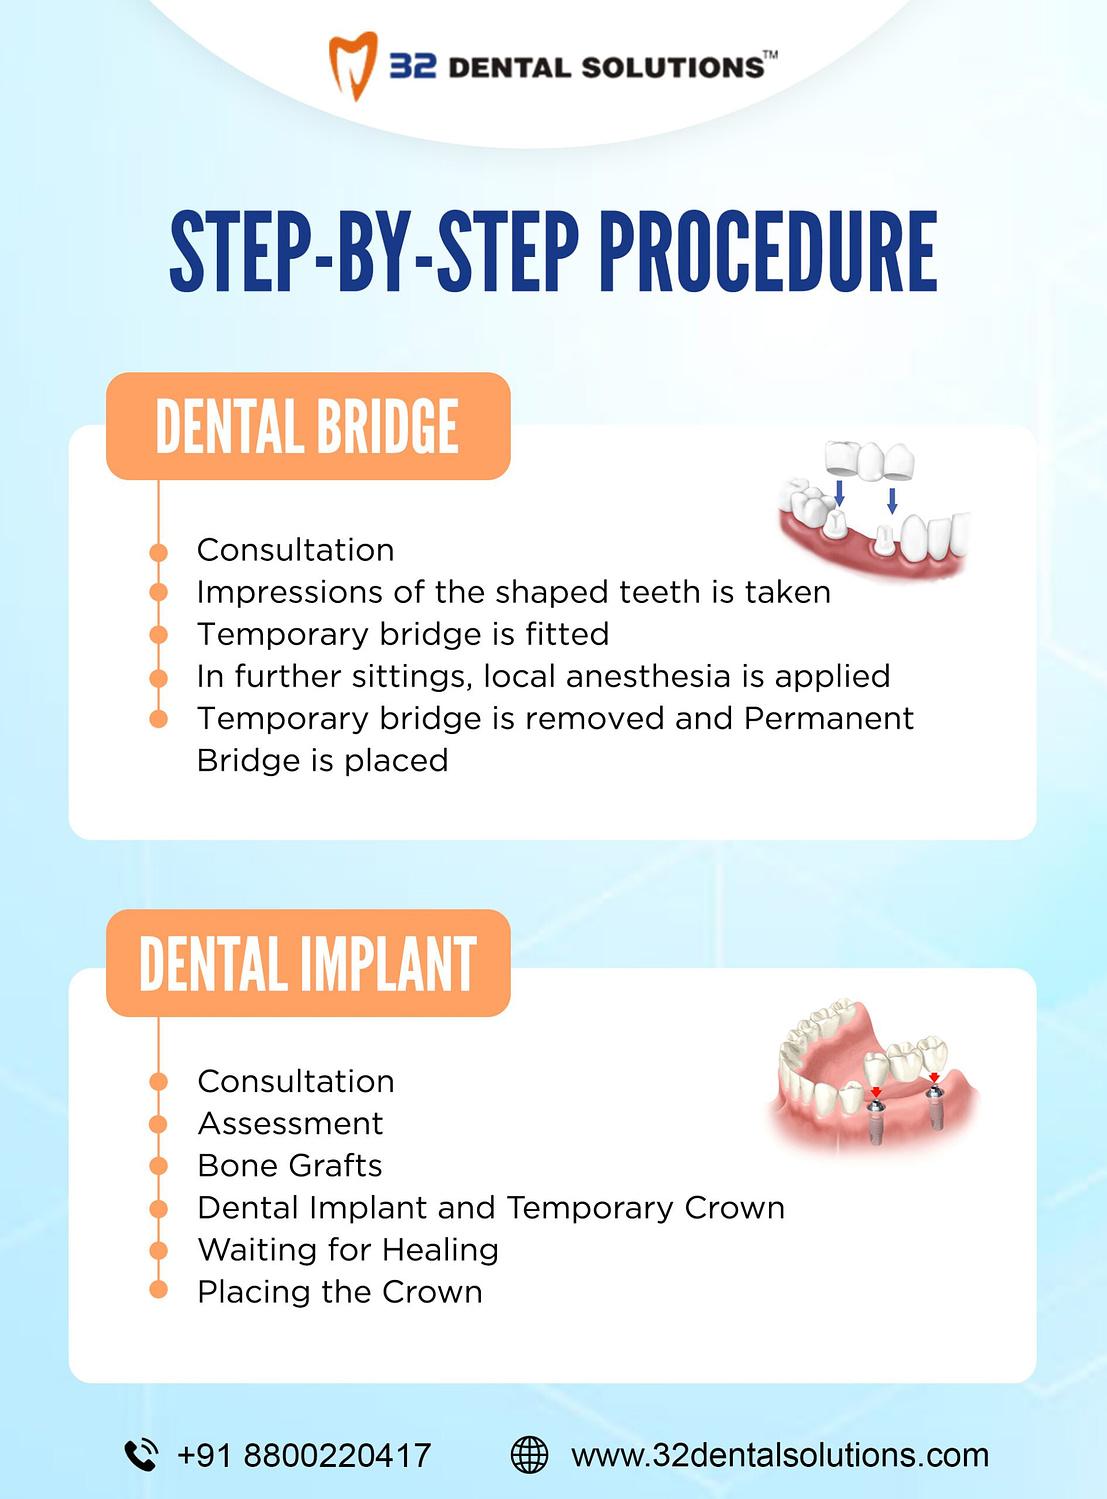 Procedure for Dental Bridge and Dental Implant